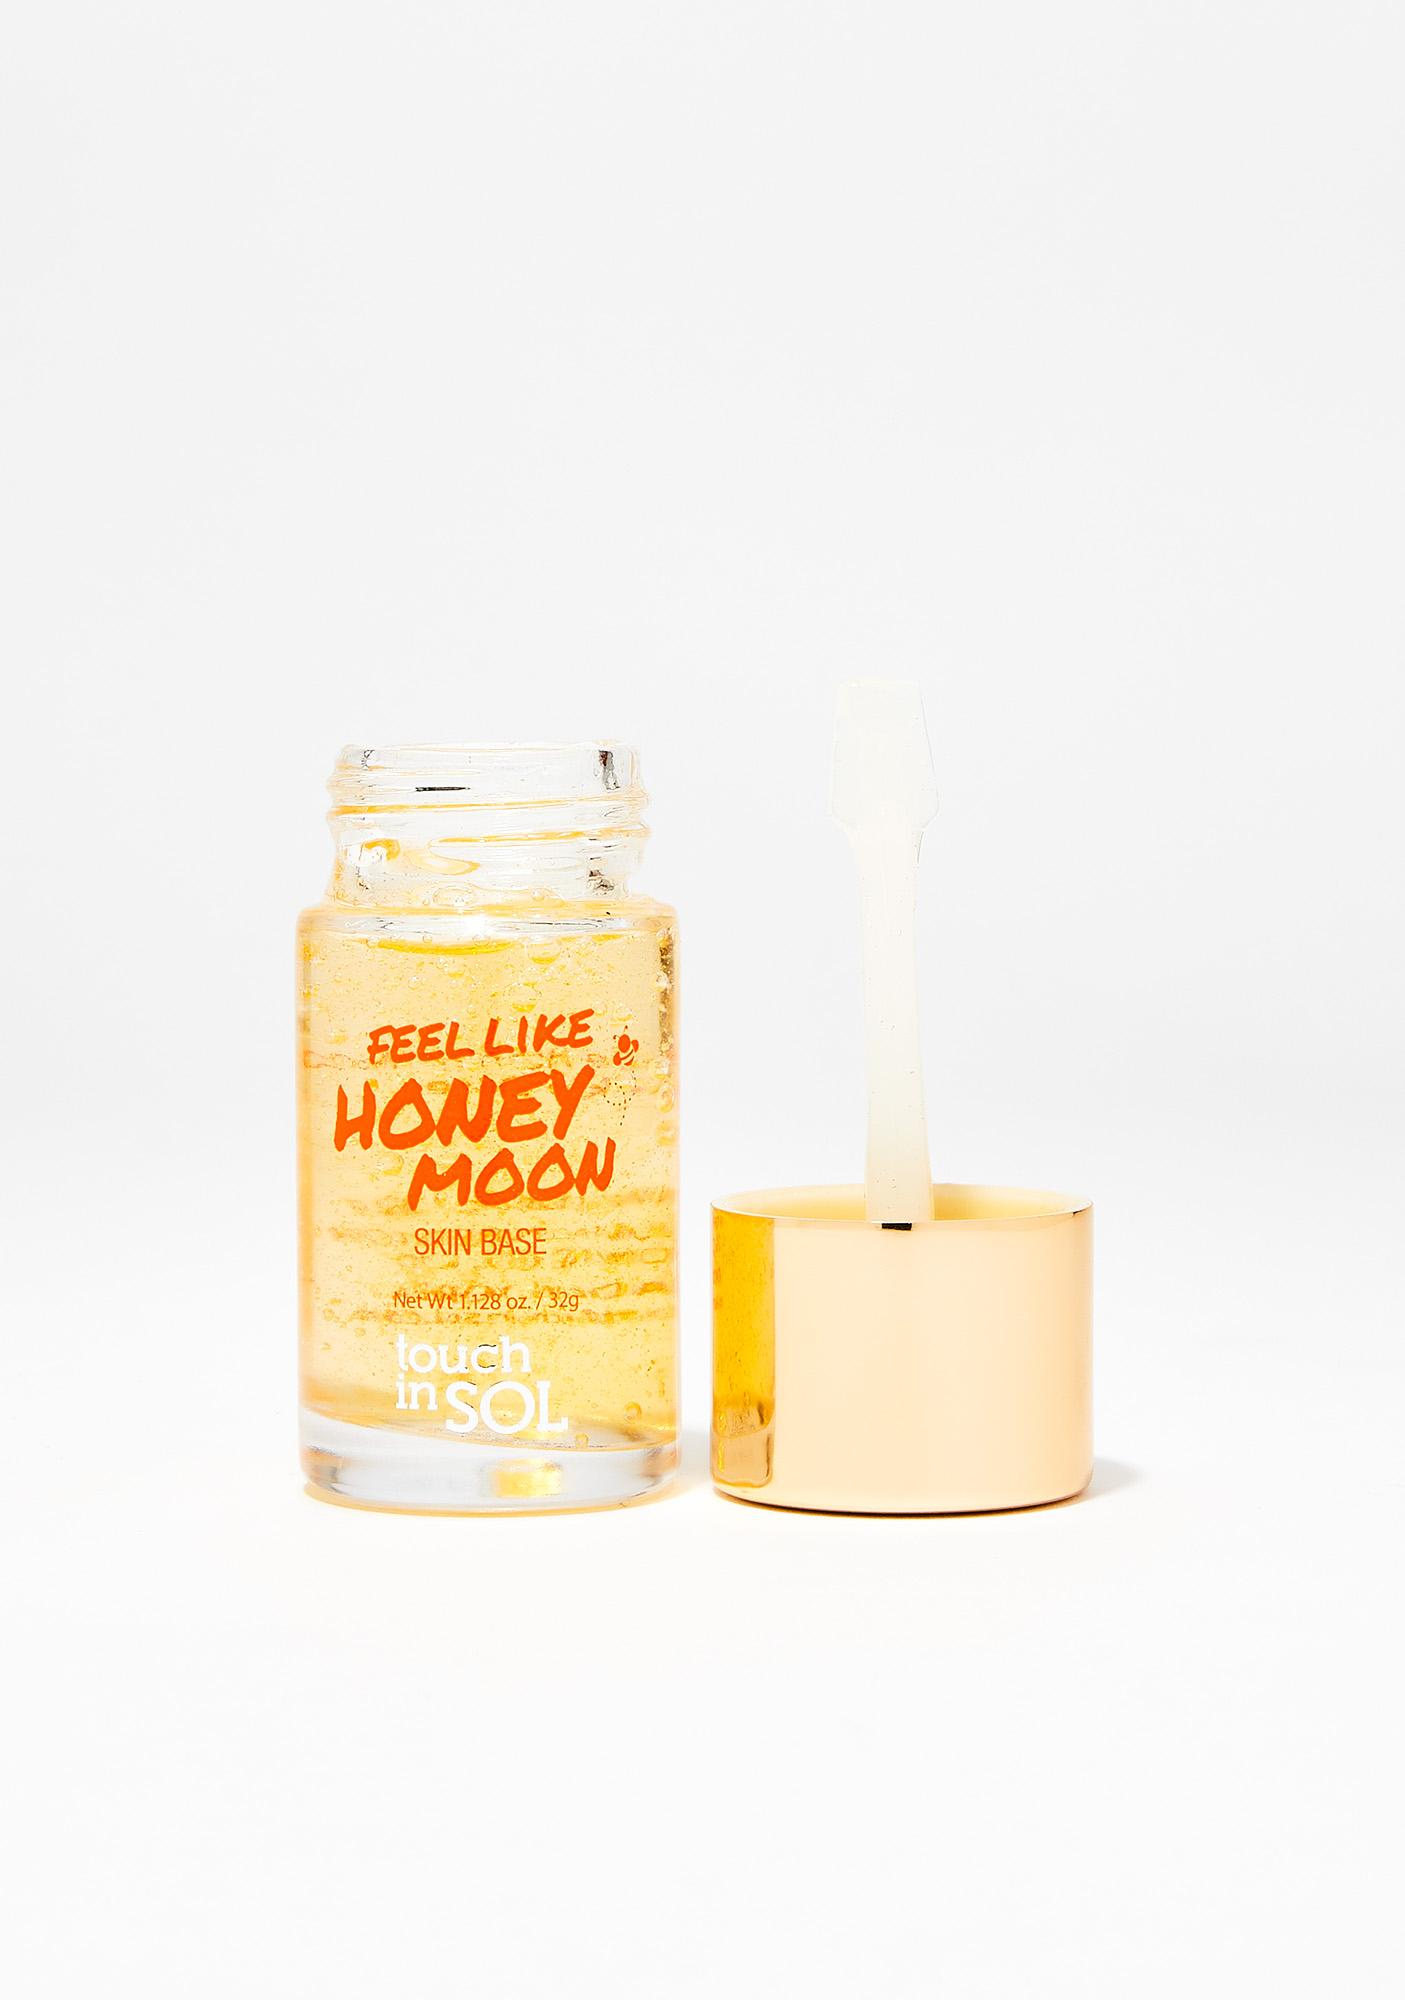 Touch In Sol Feel Like Honey Skin Base